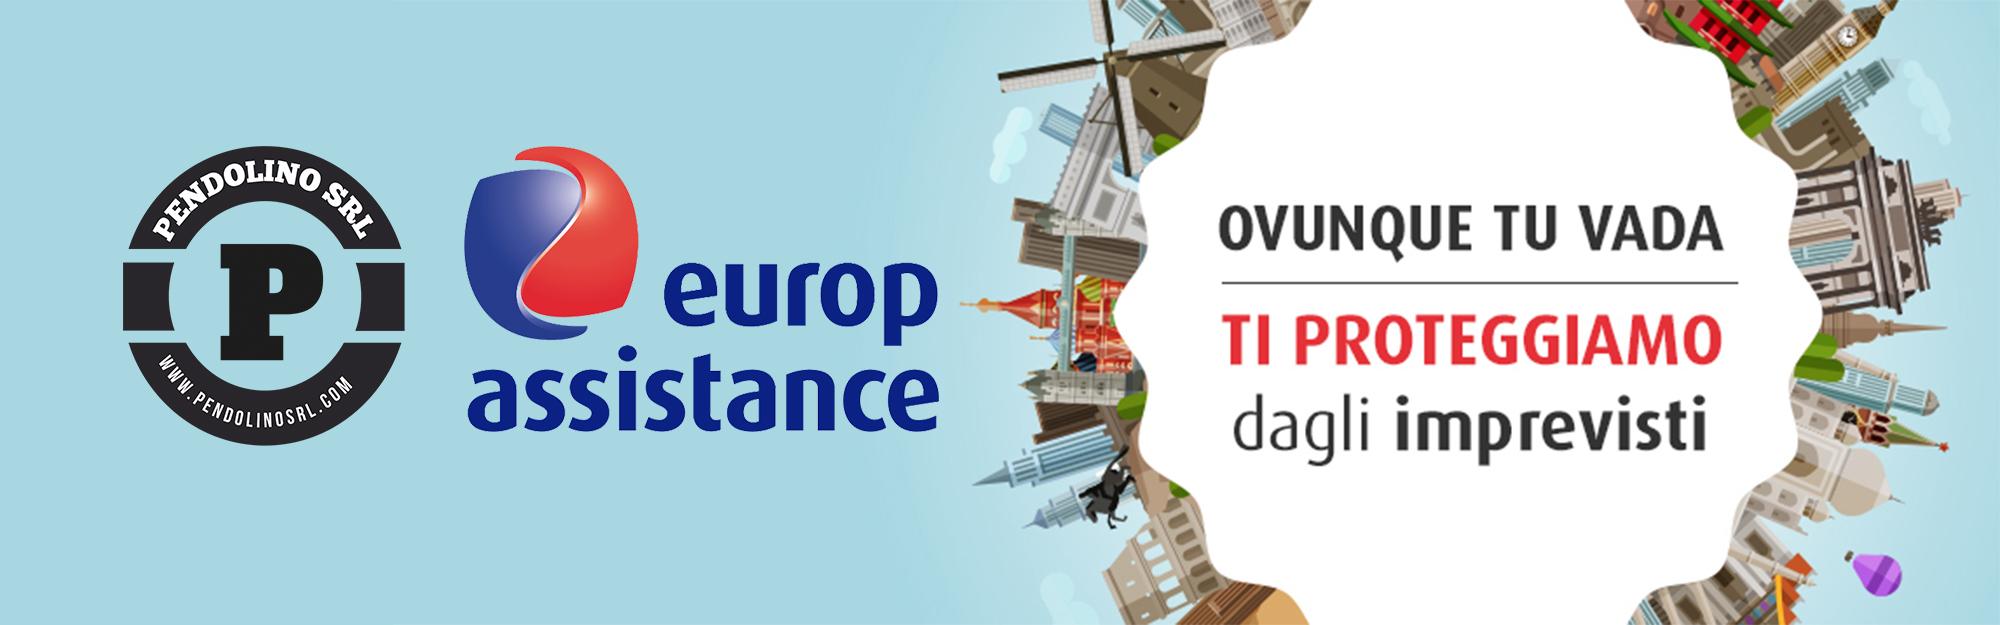 slide_europ_assitance